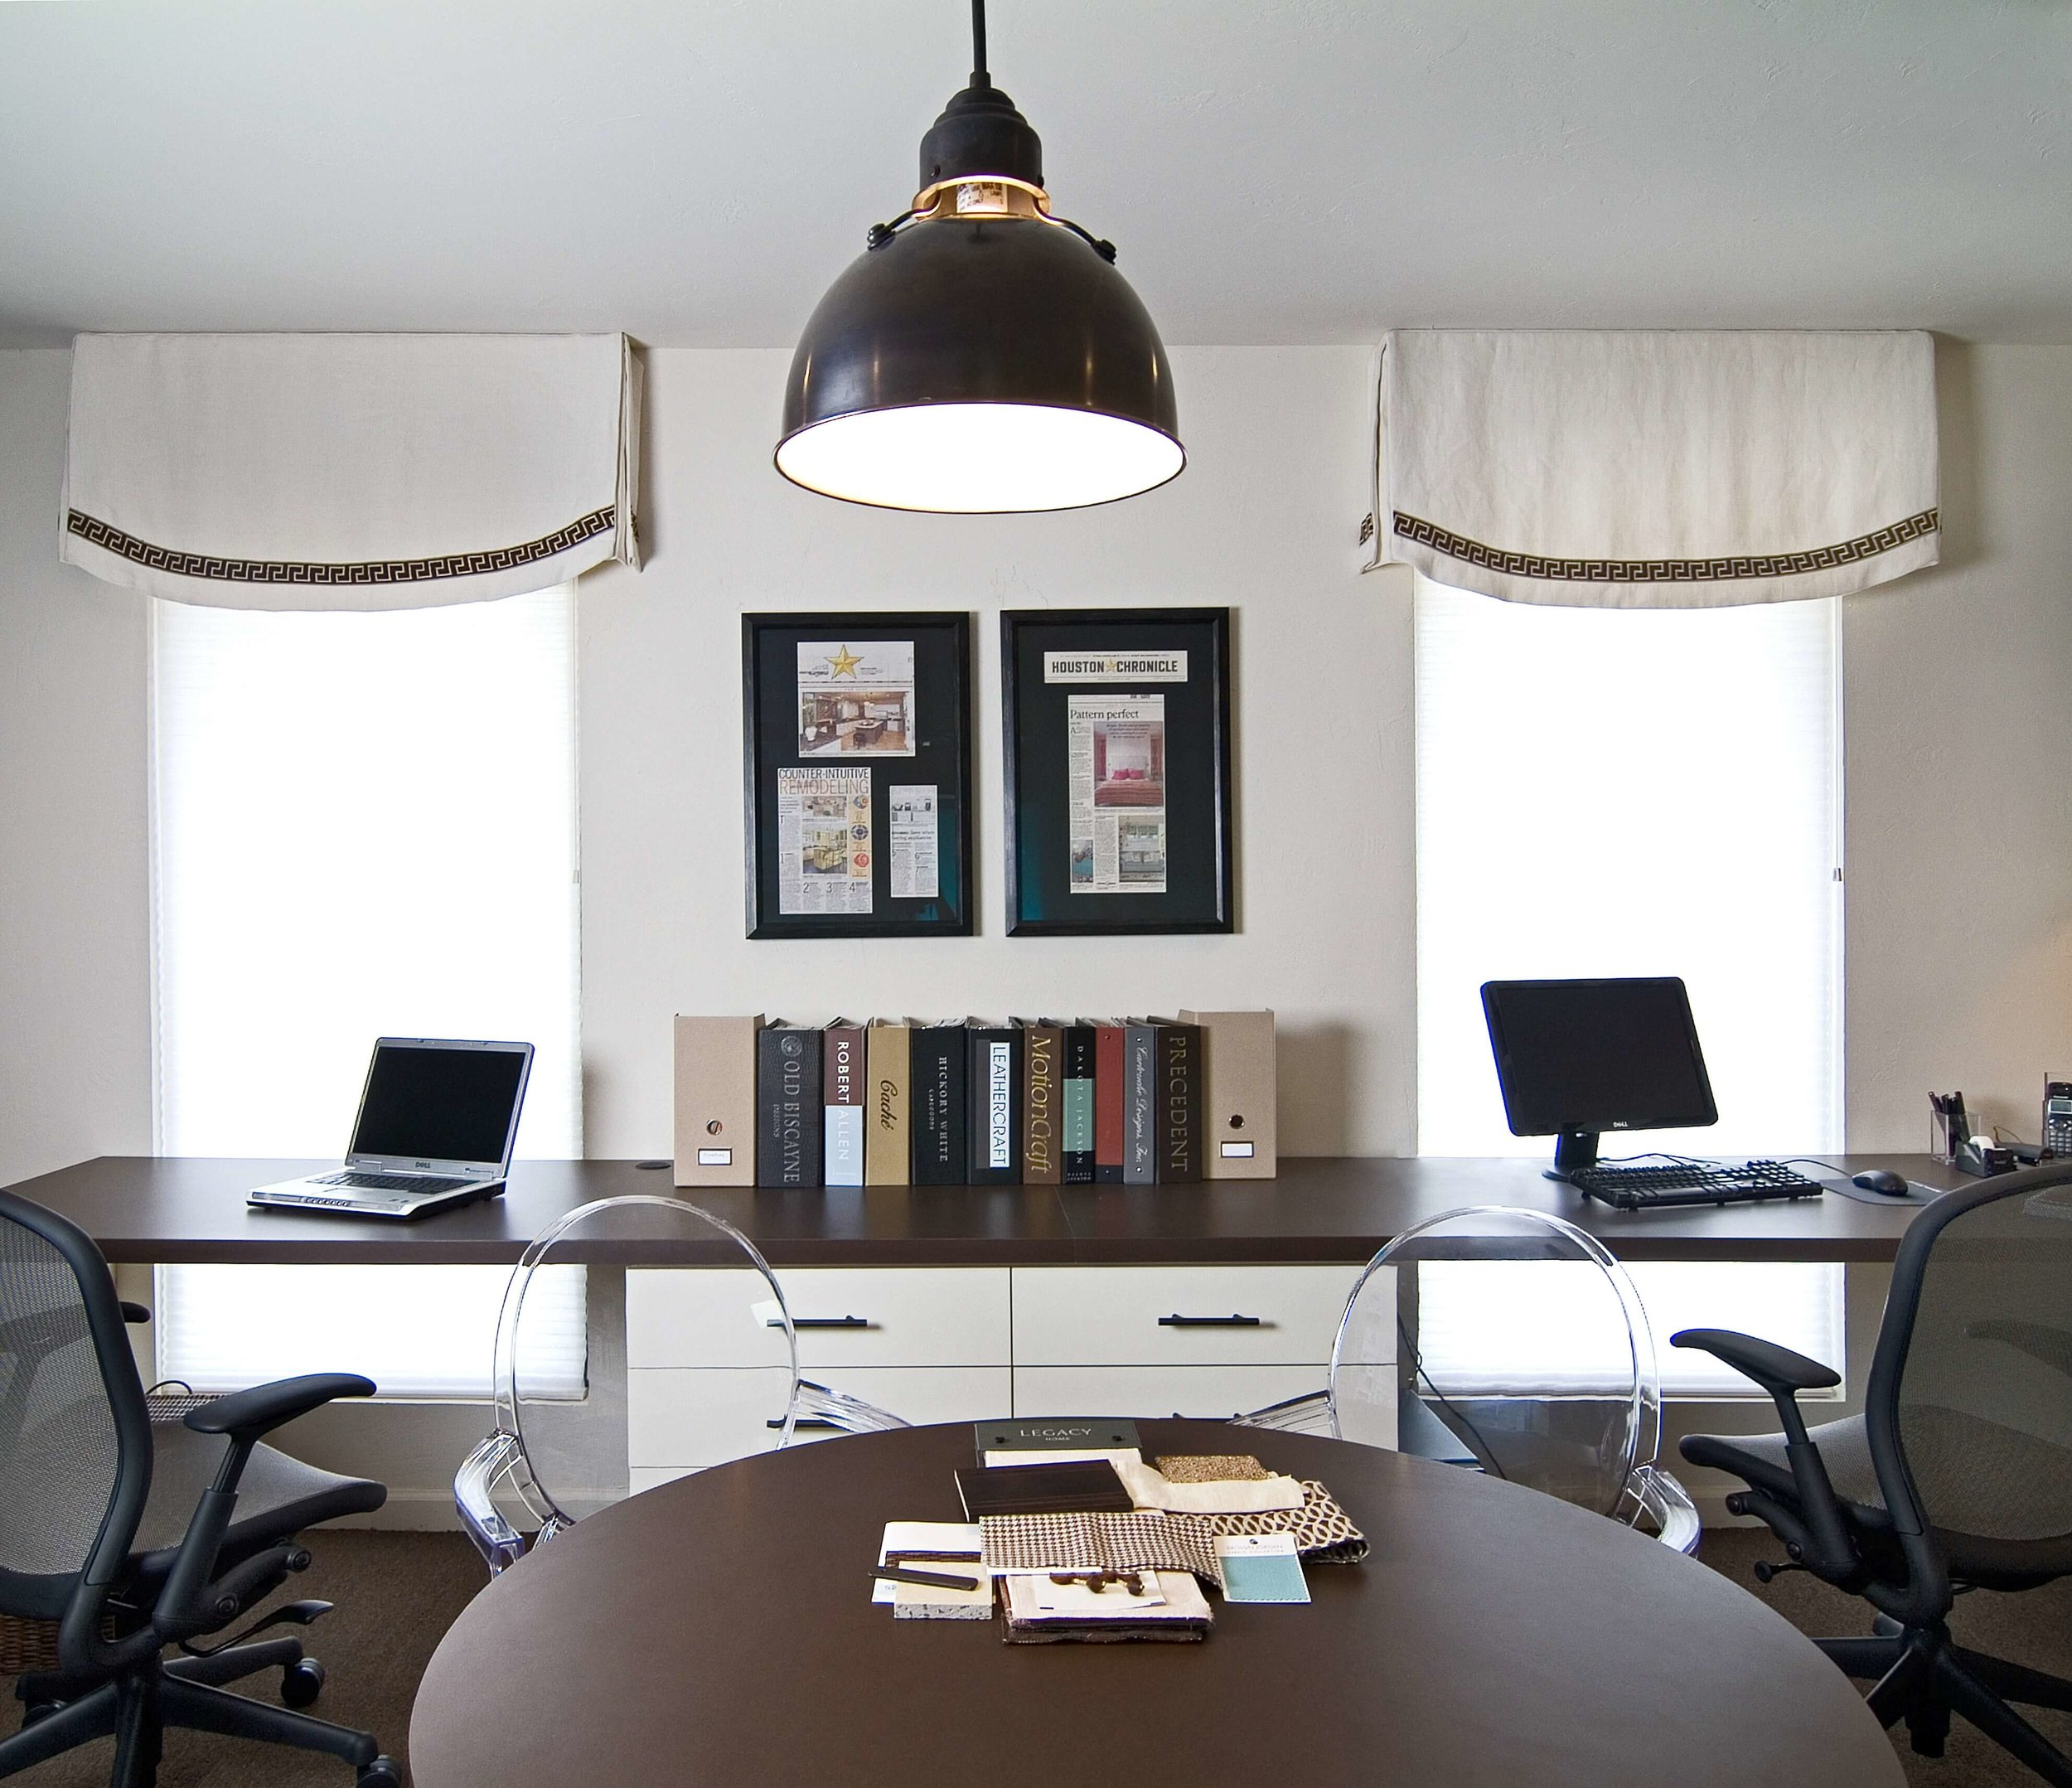 Interior design studio | My first interior design studio outside my home 2009 | #officedesign #interiordesigner